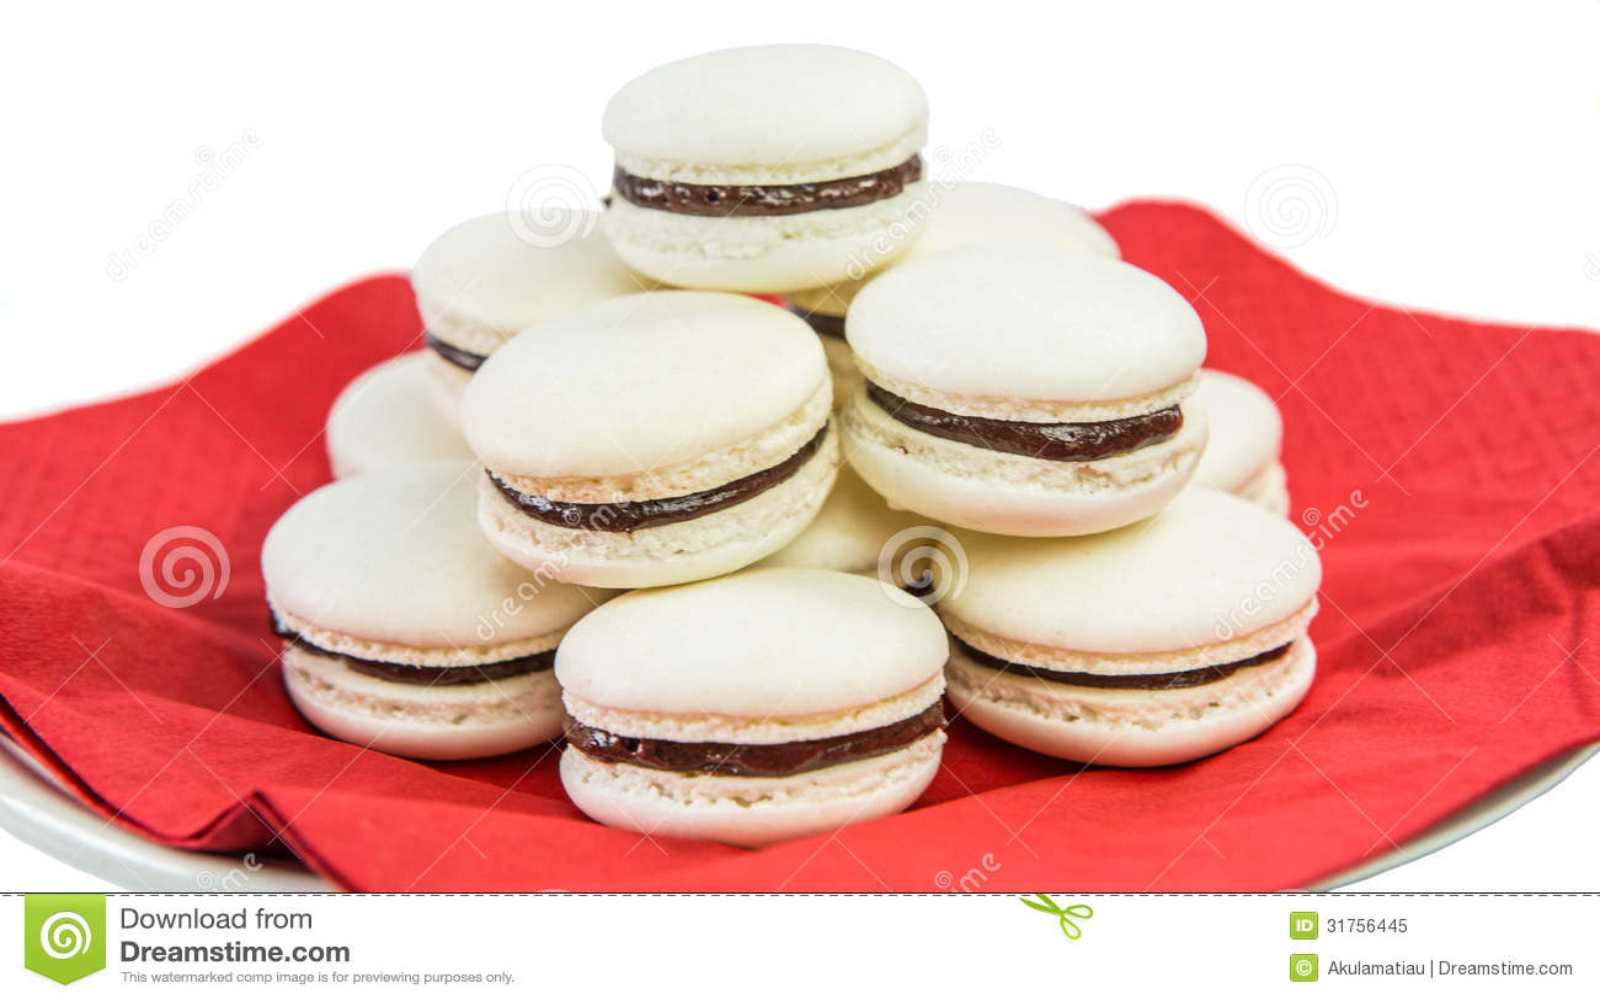 Vanilla Flavored French Macarons I Royalty Free Stock Photo - Image ...